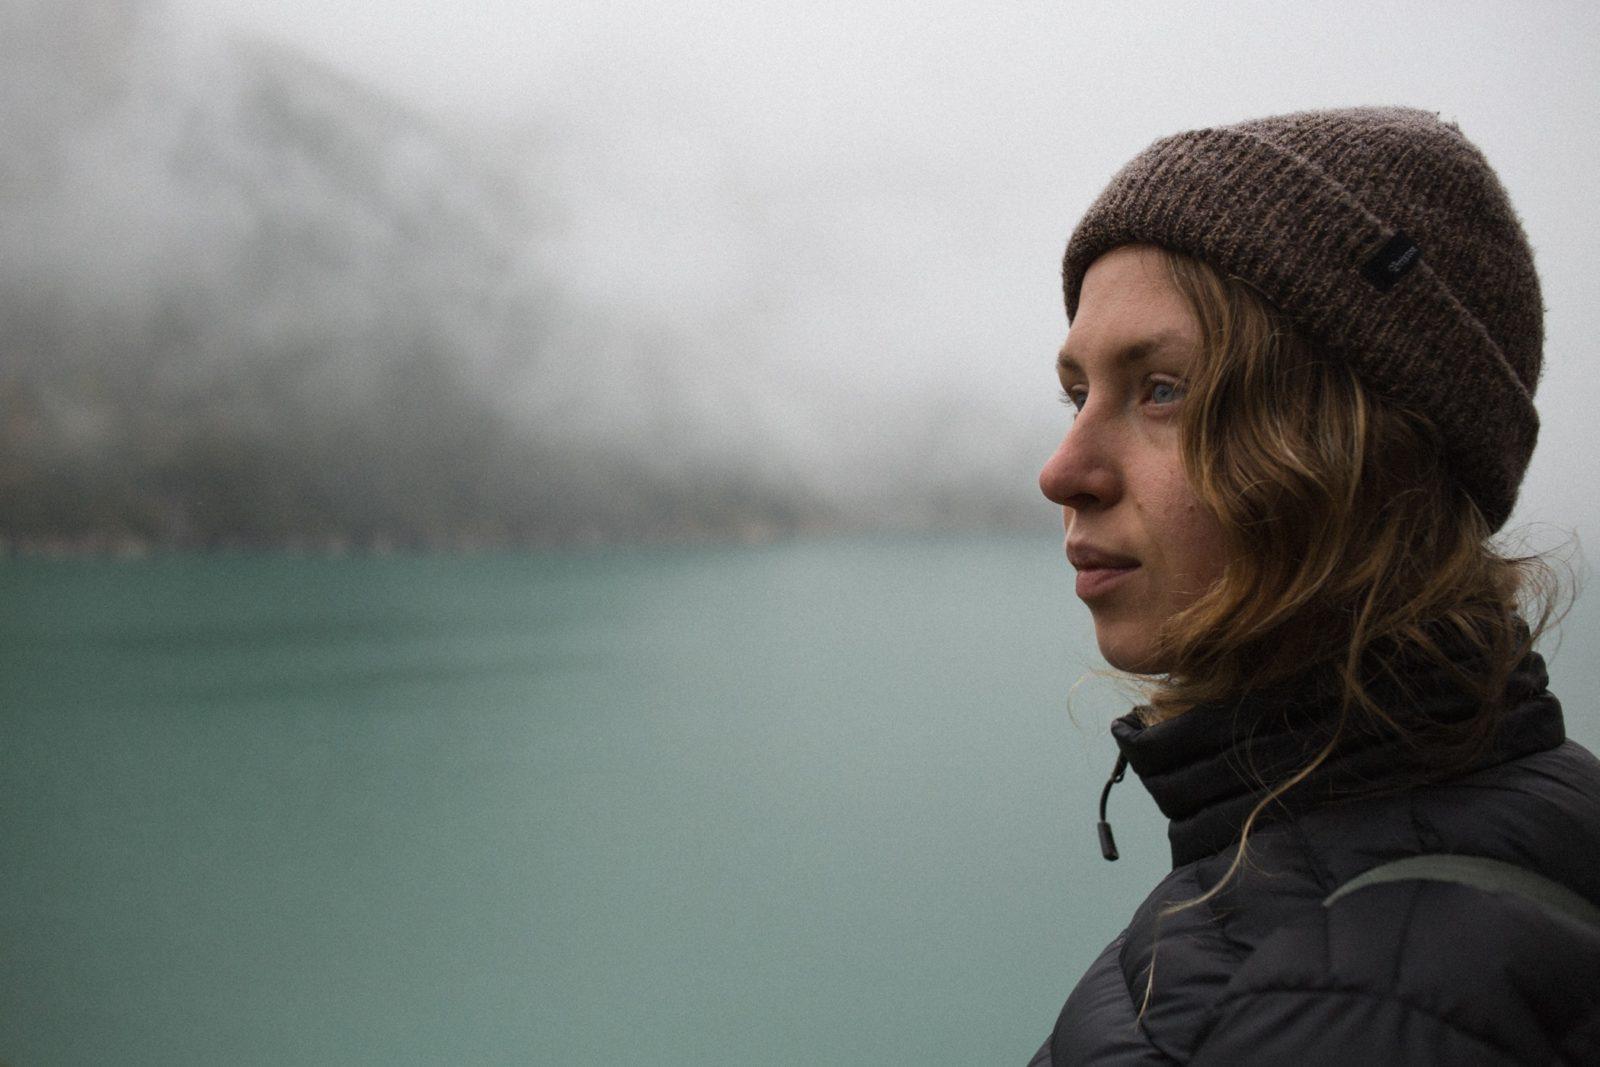 Lara Keuthen / Peppermynta / Artikel über das Waldbaden / Foto: Roman Dachsel / GROSS∆RTIG